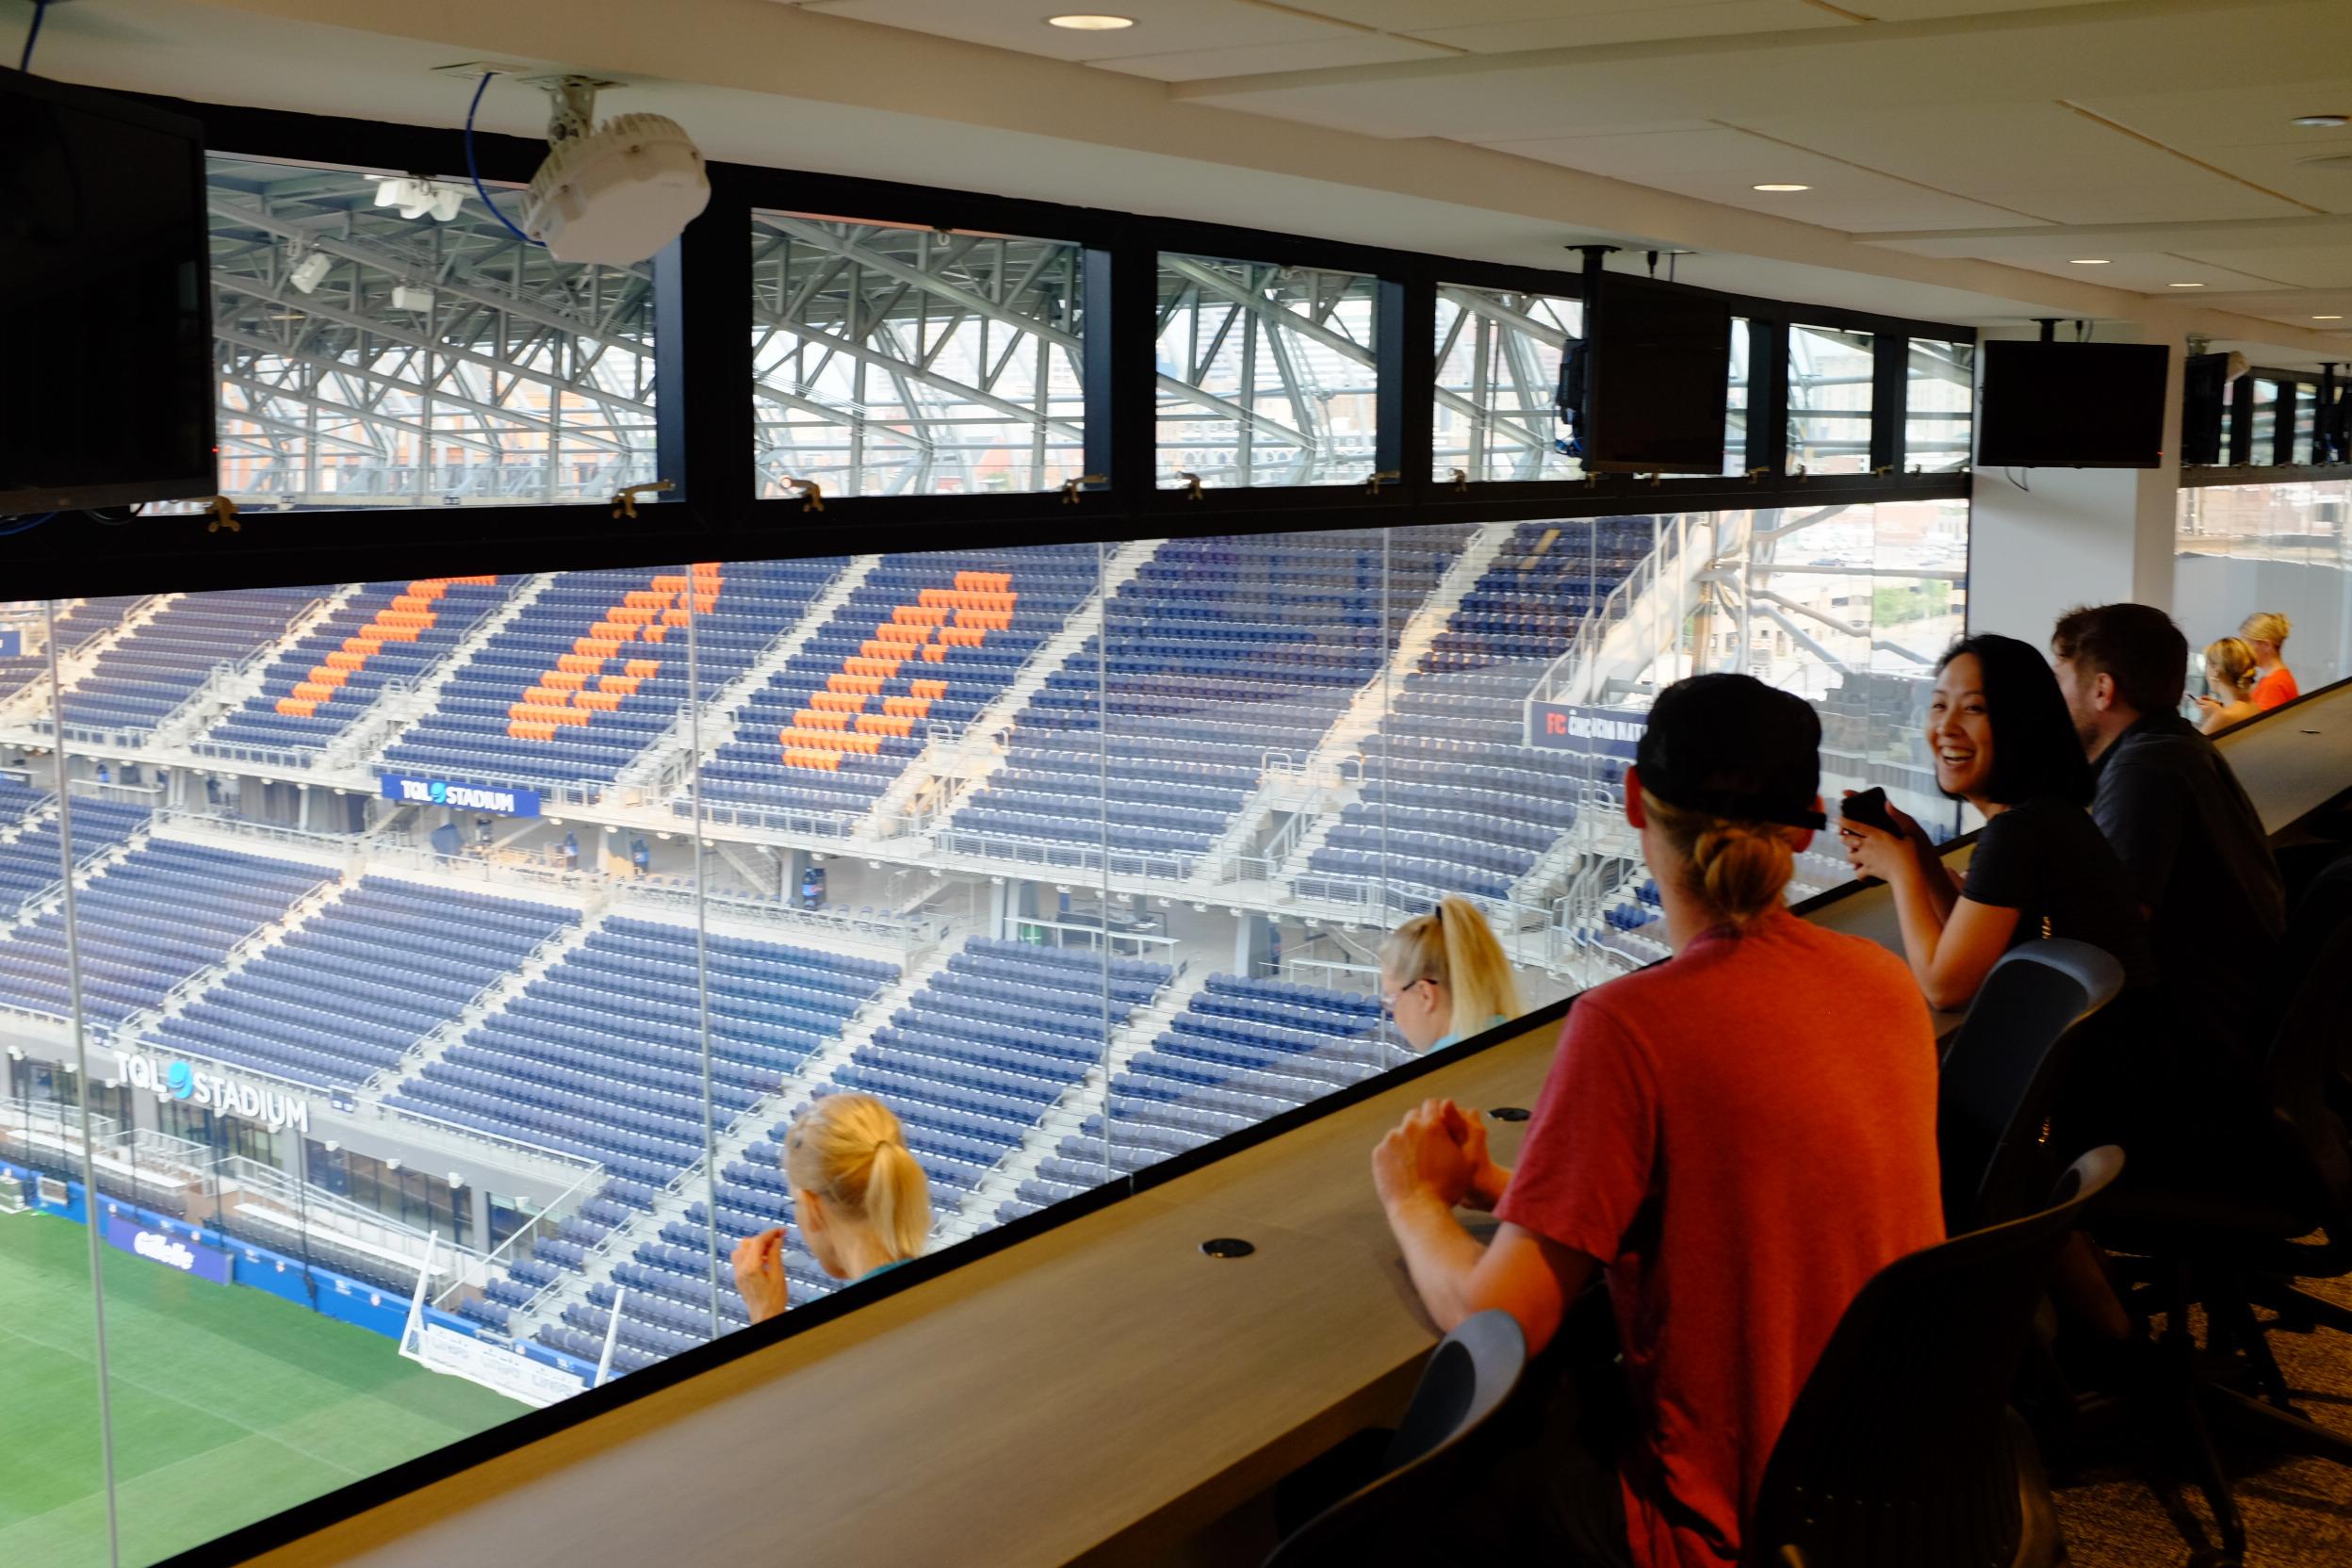 Tour group seated in stadium press box